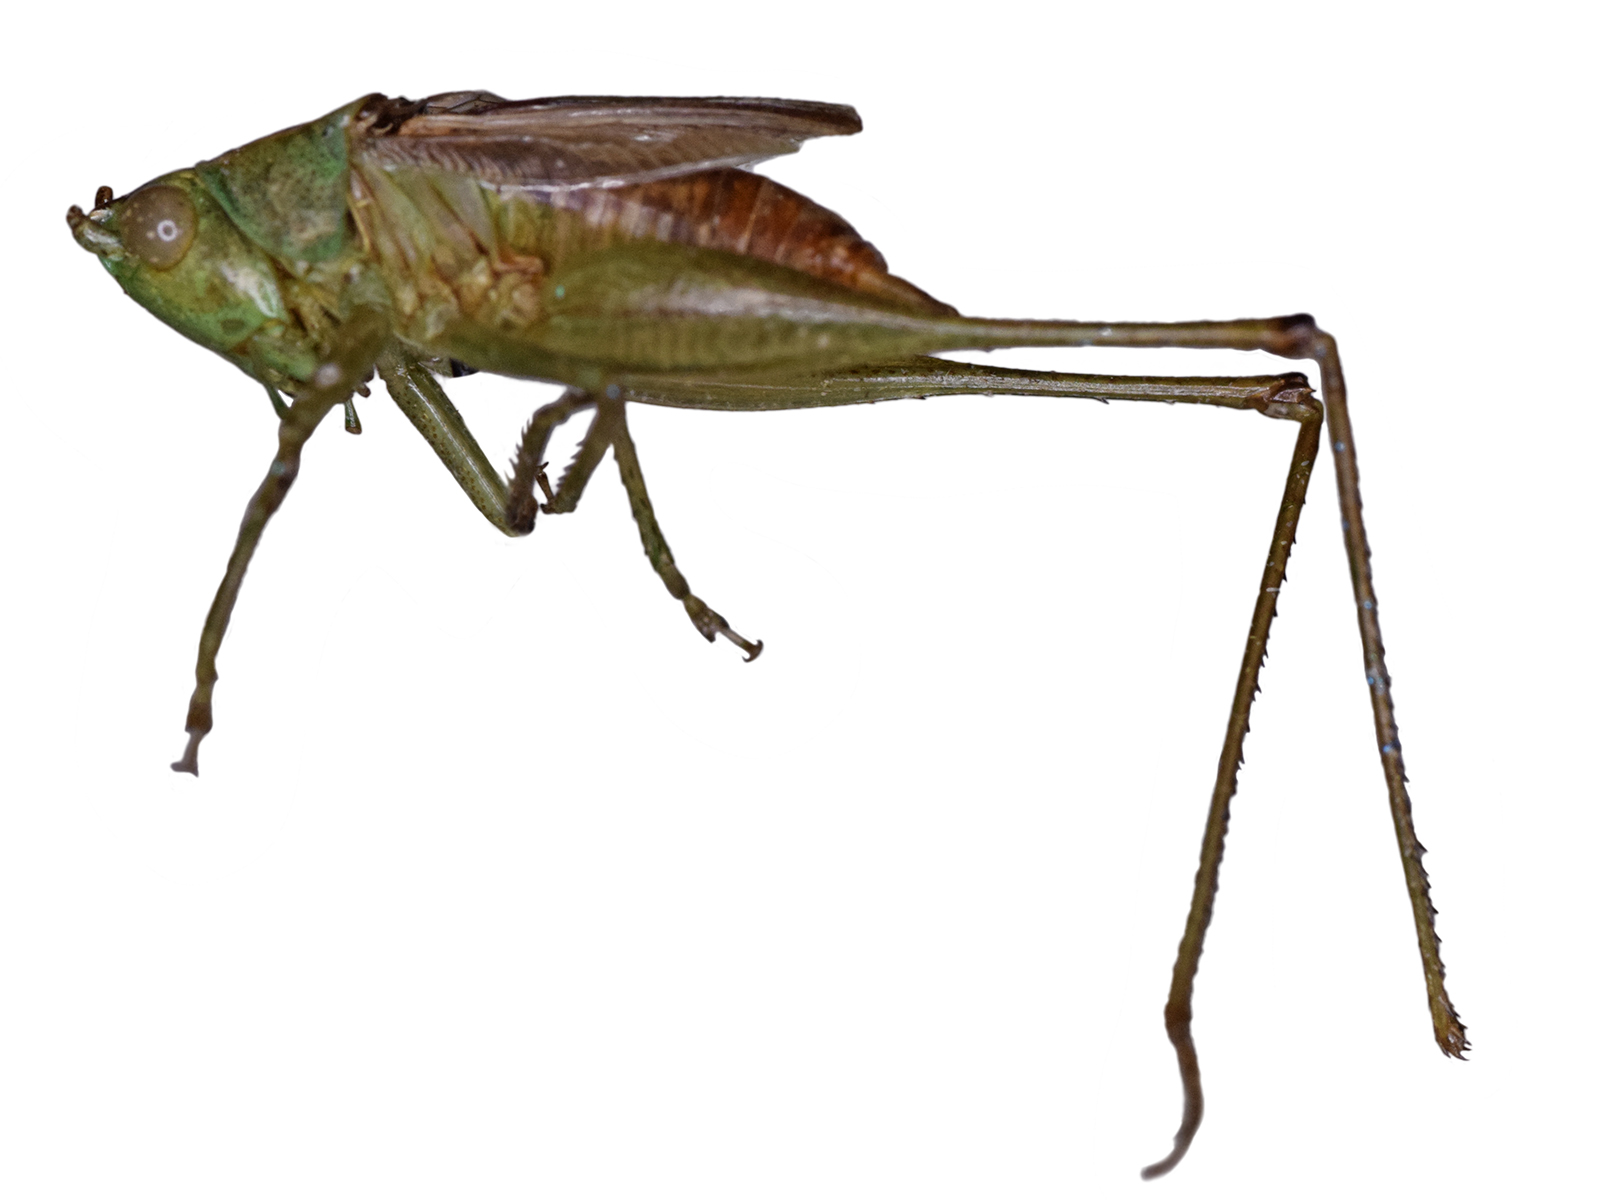 Conocephalus angustifrons (Redtenbacher, 1891)